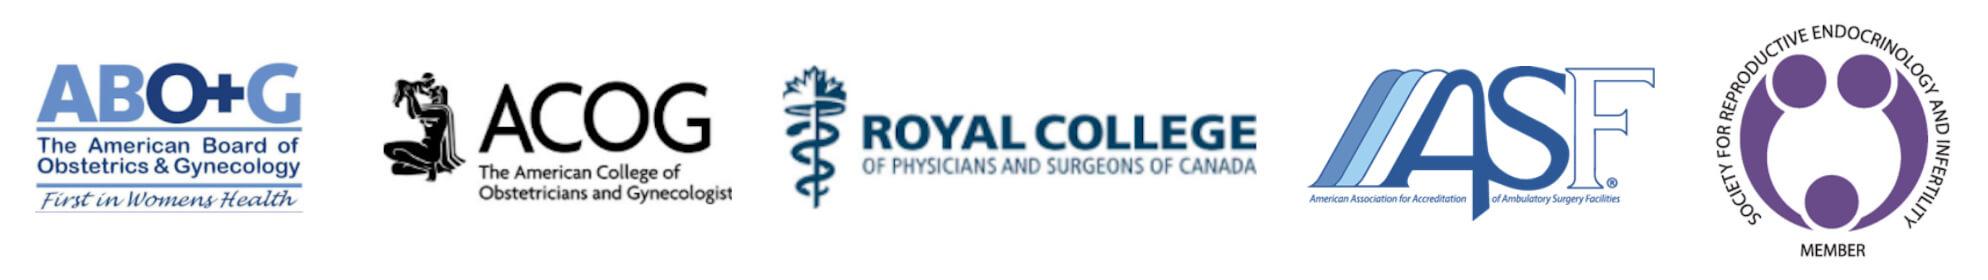 medical certification logos